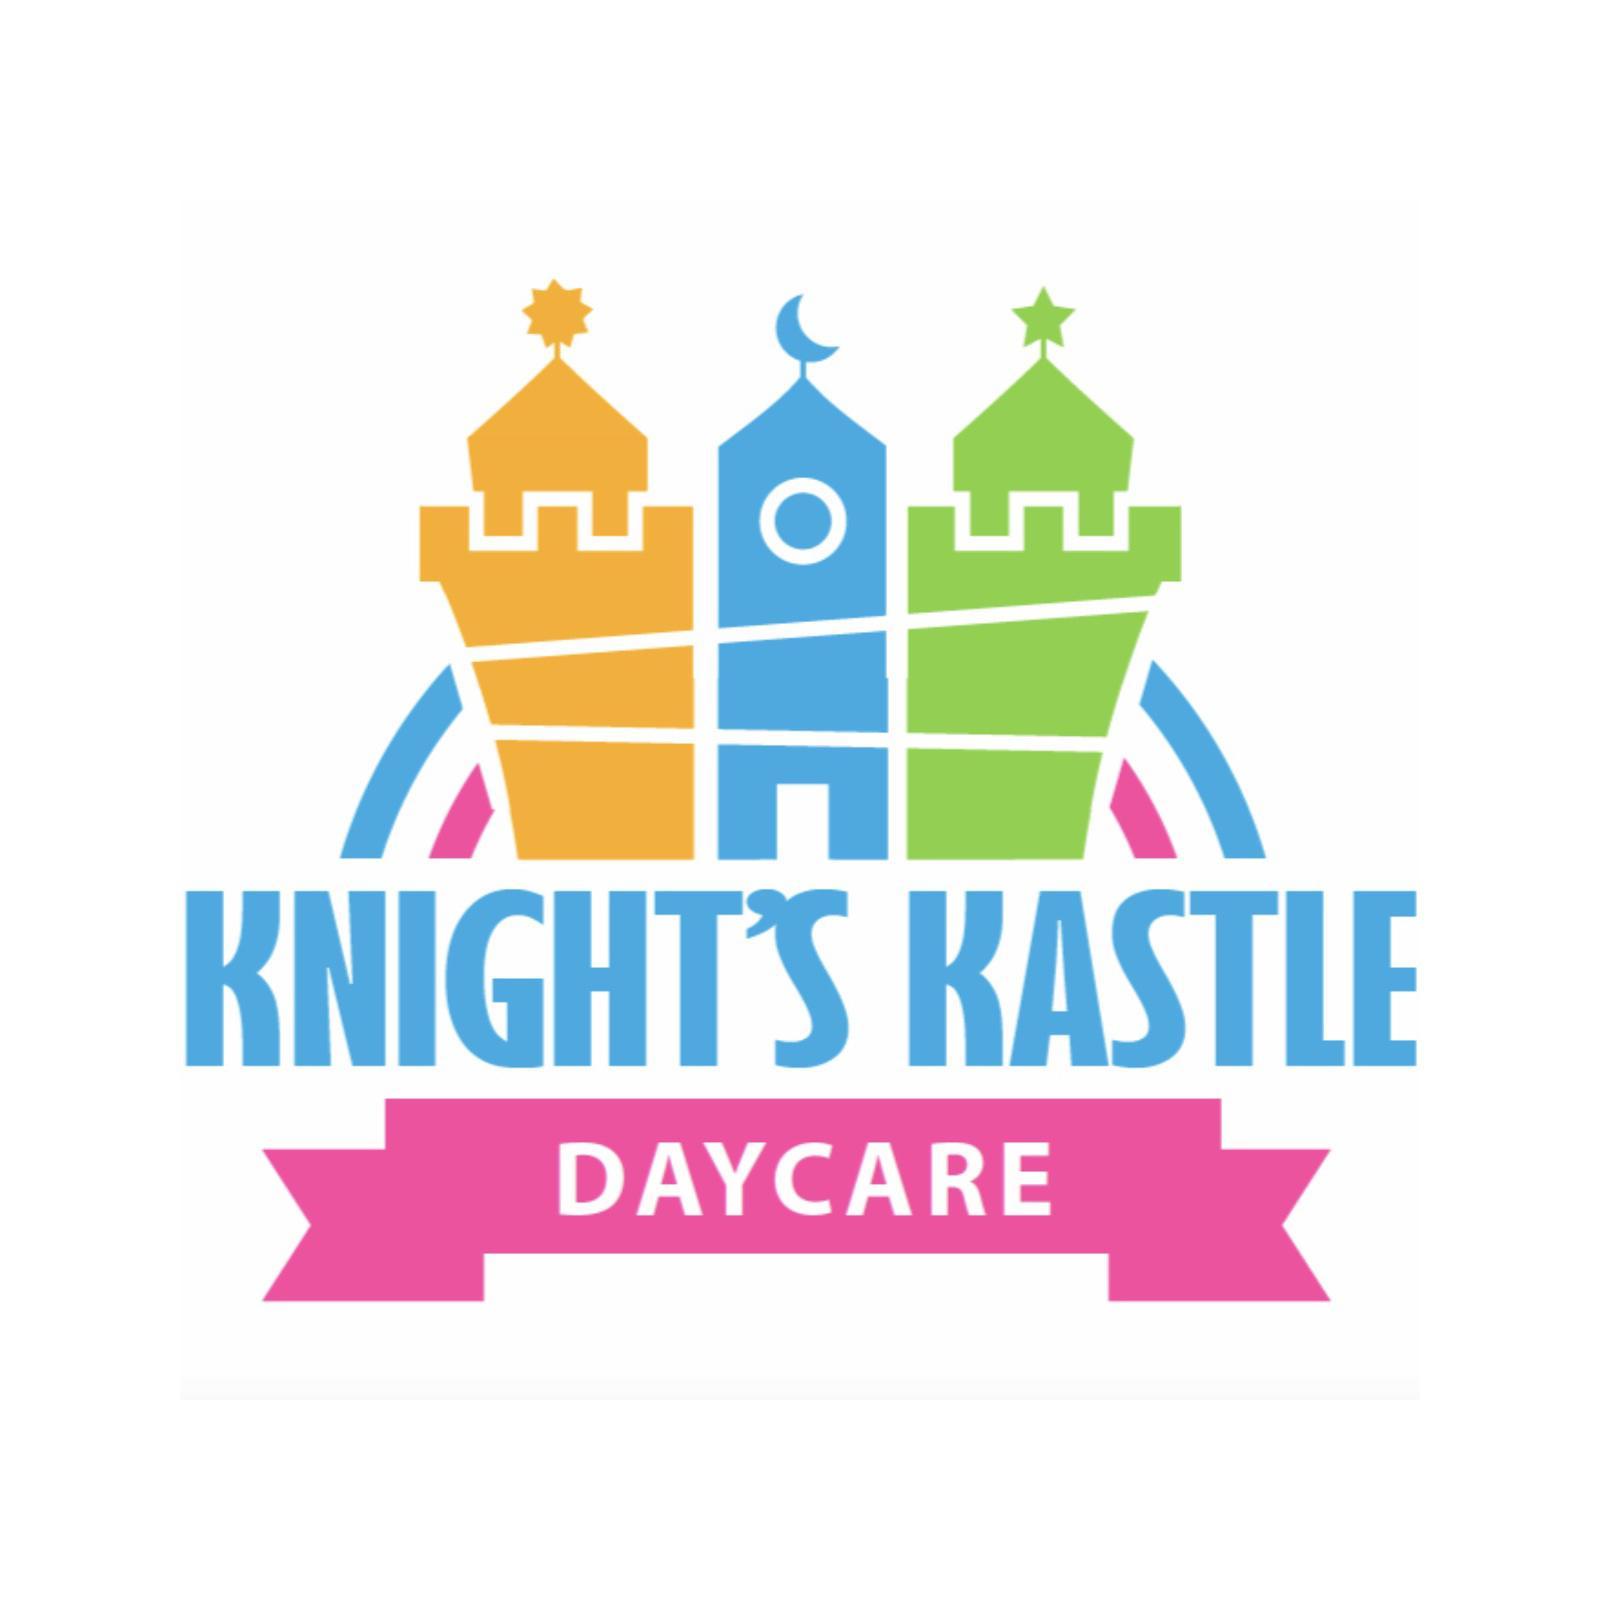 Knight's Kastle daycare